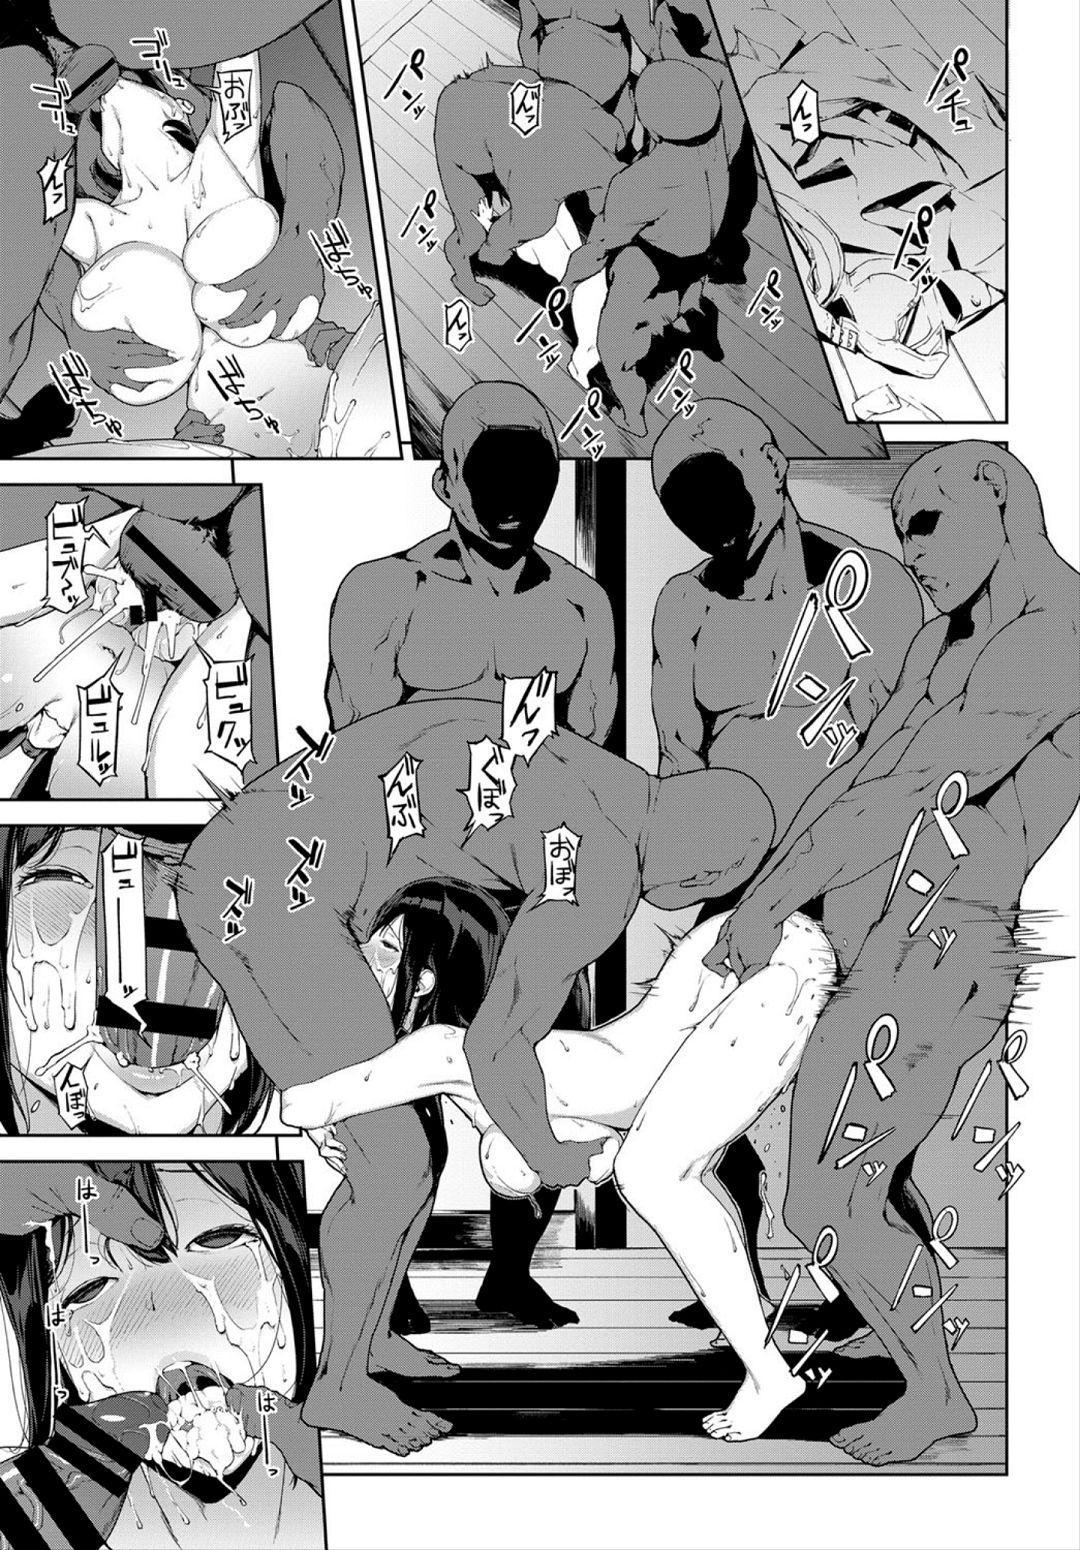 Anata no Ushiro - I'm behind. 16